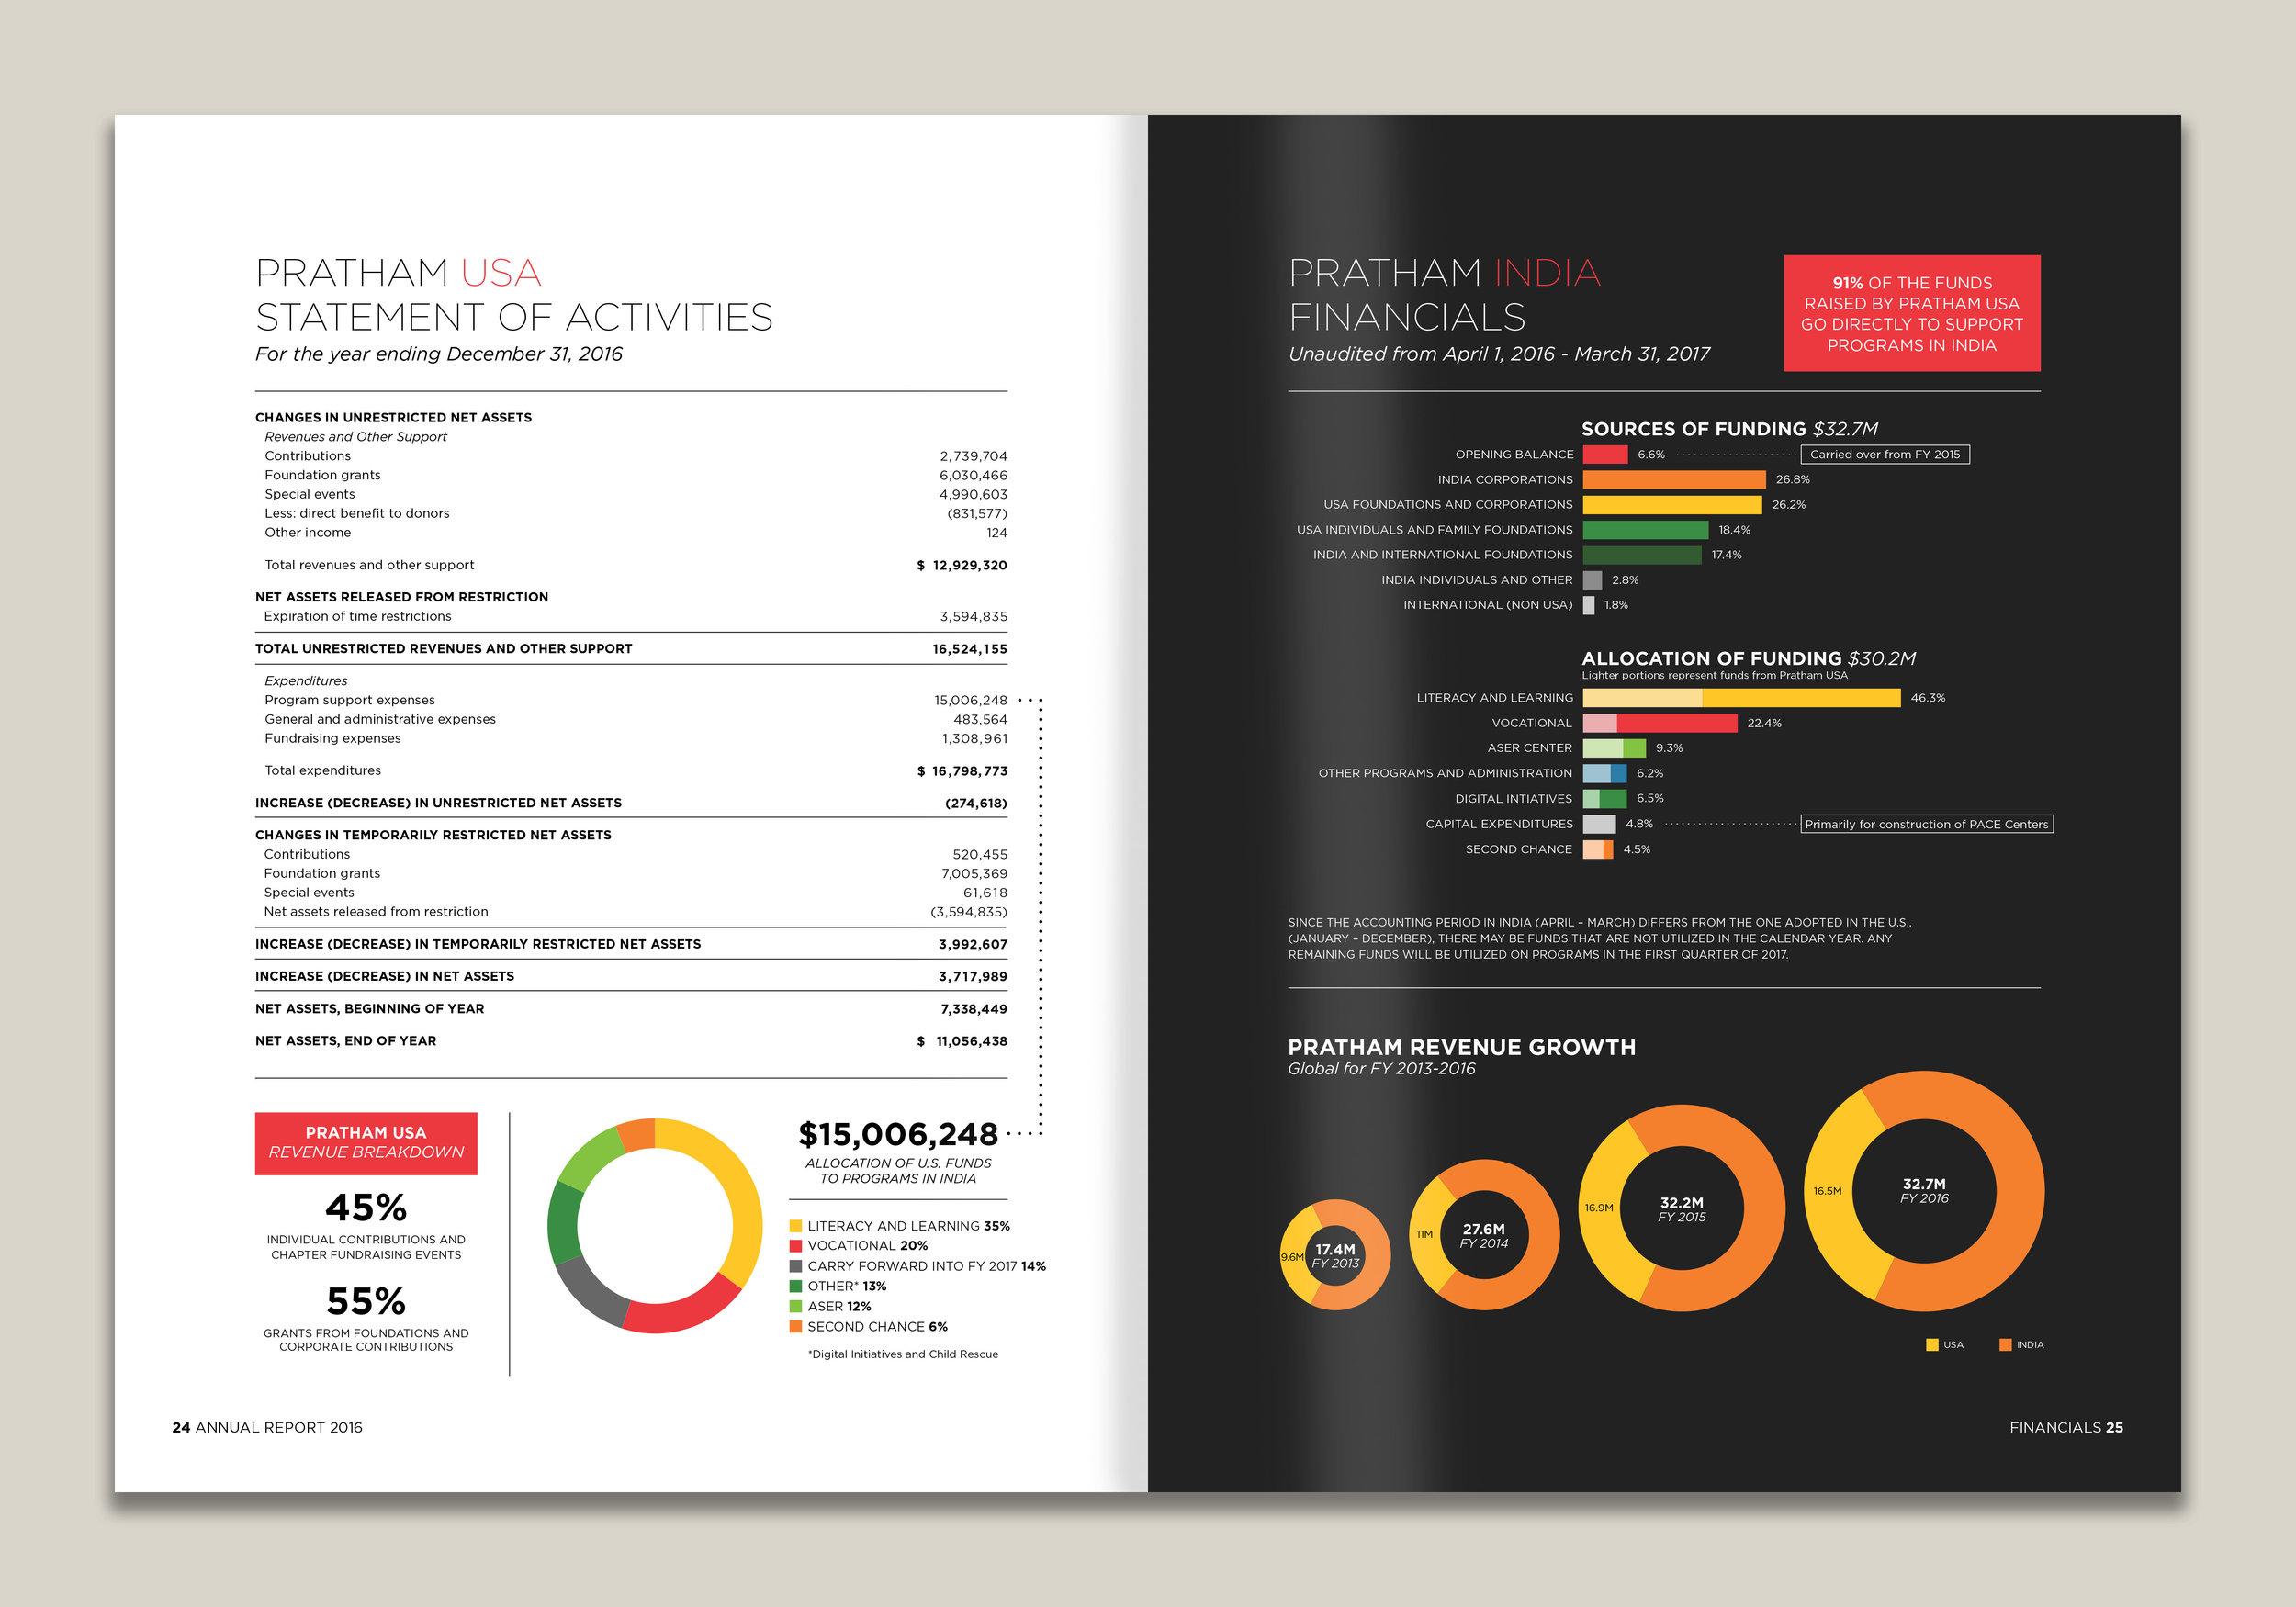 annual report 2016 interactive spreads-13.jpg